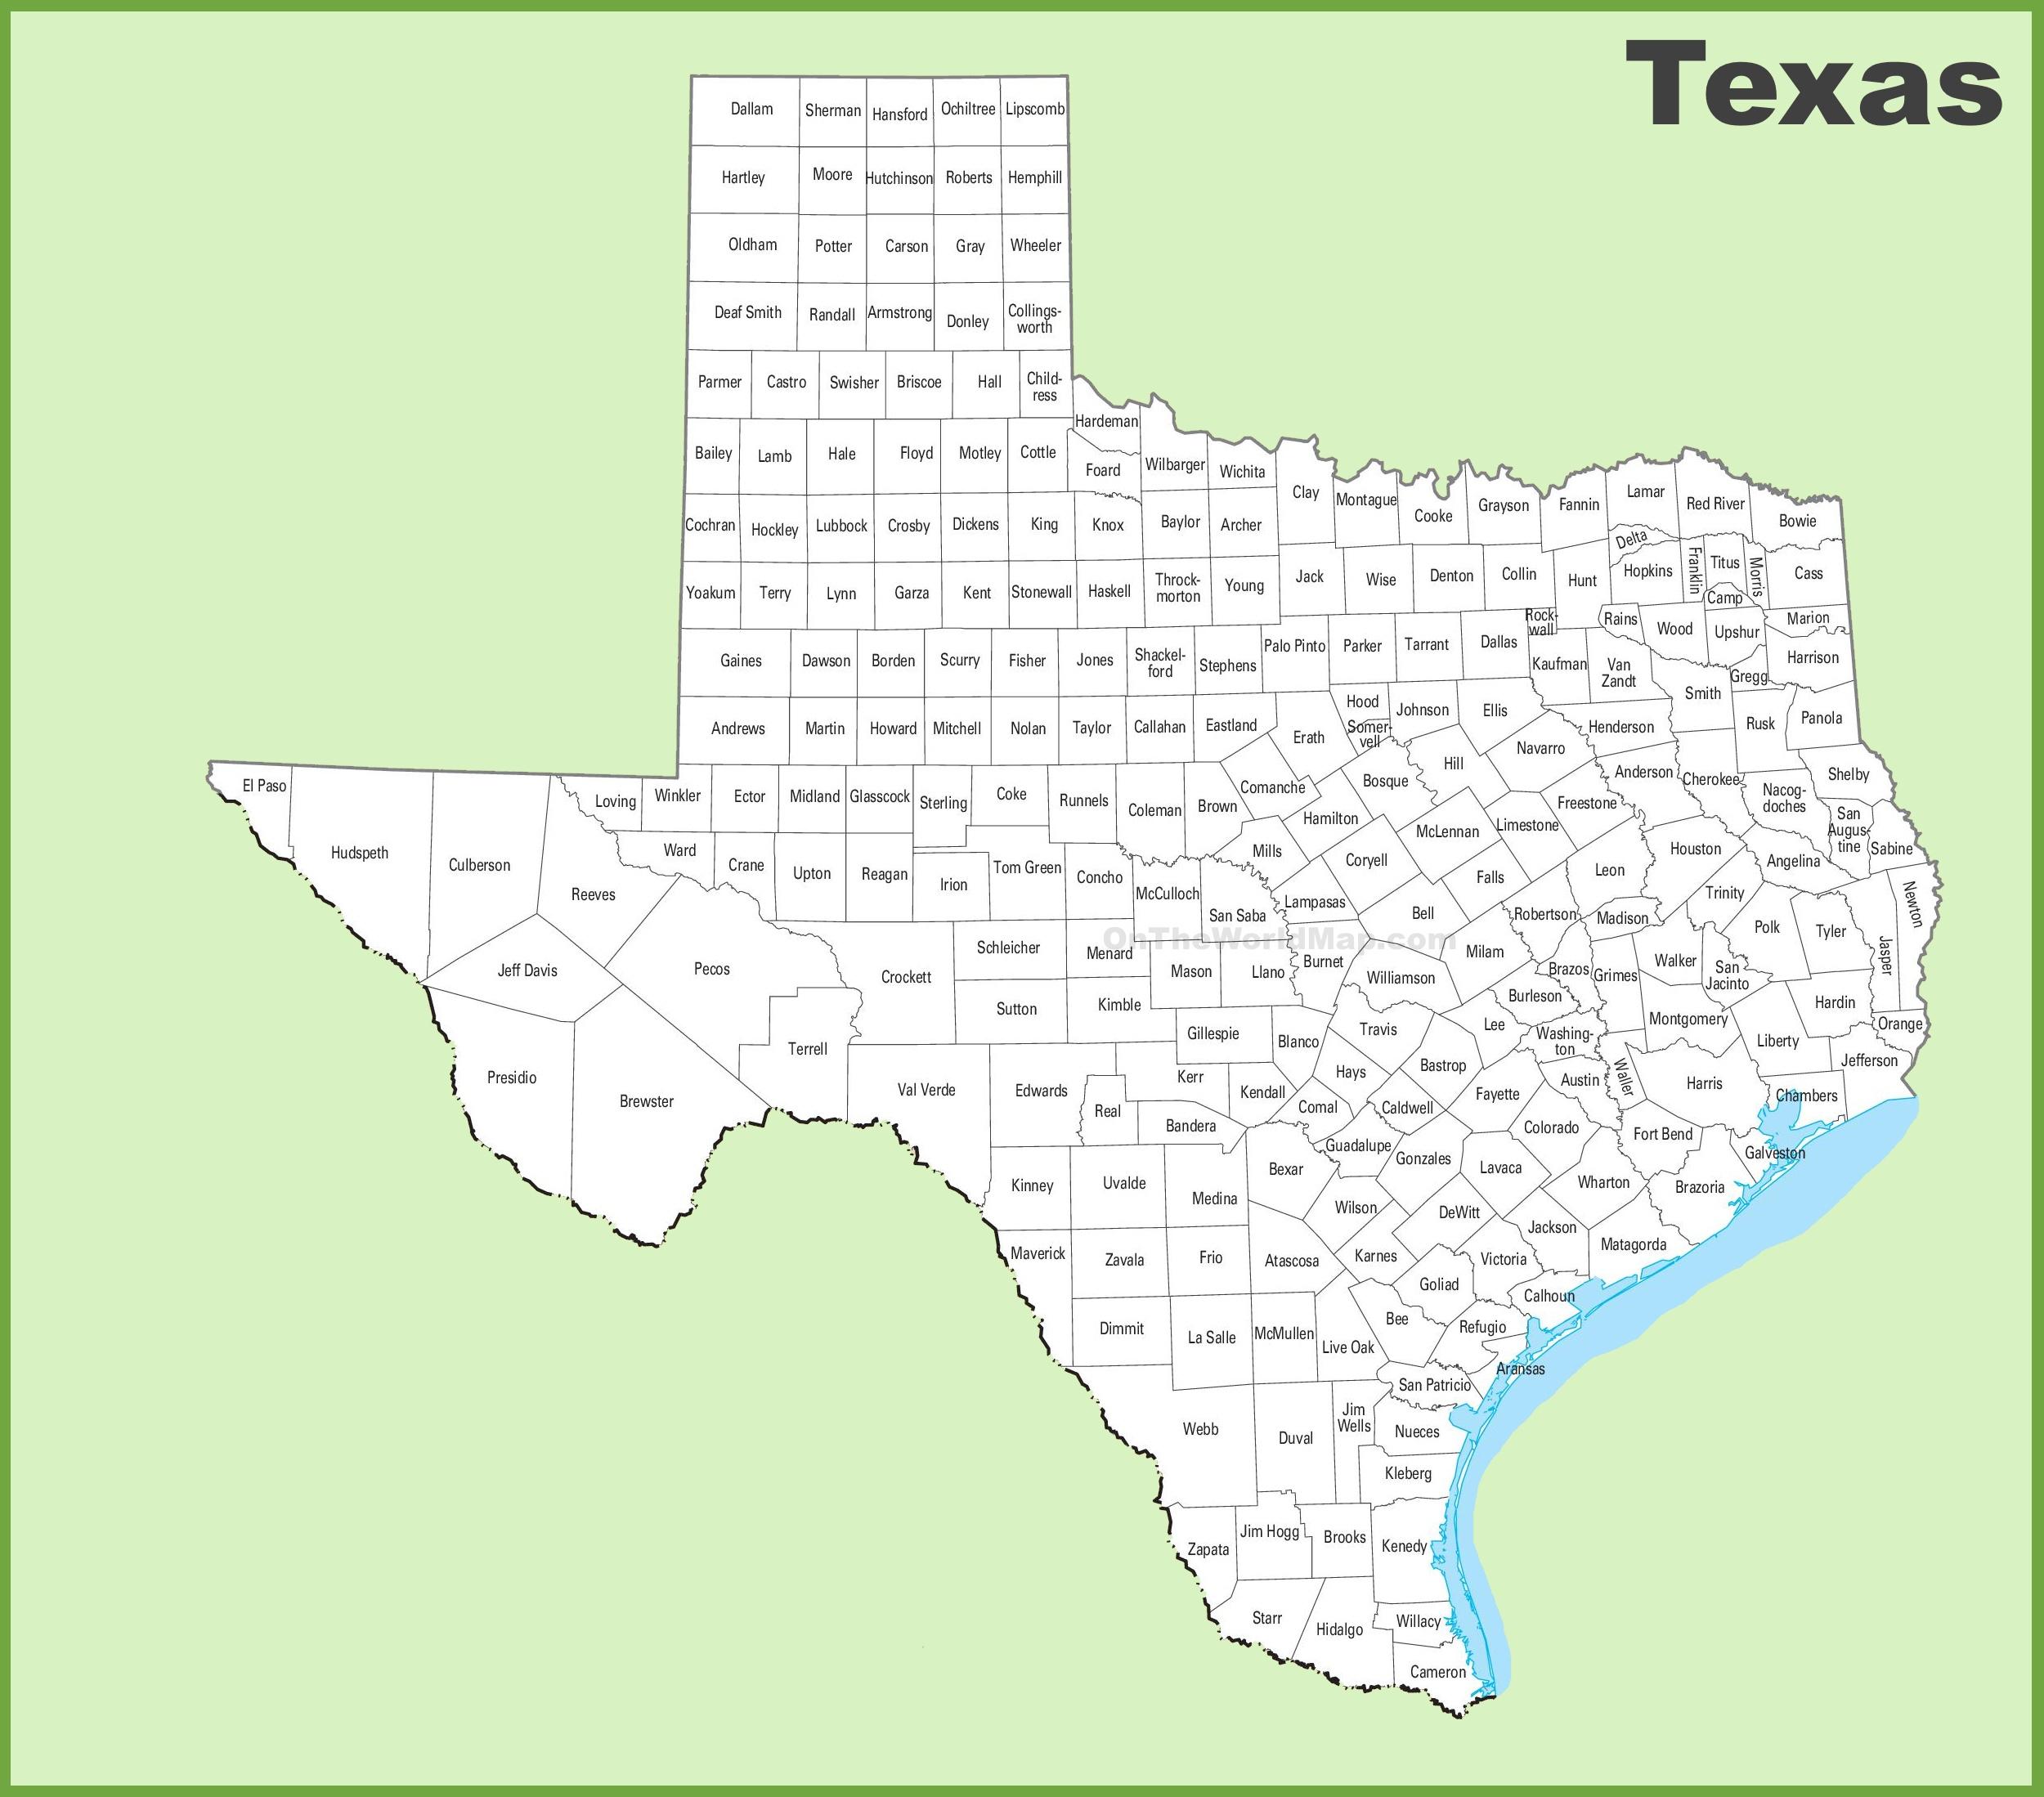 Texas County Map - Texas County Map